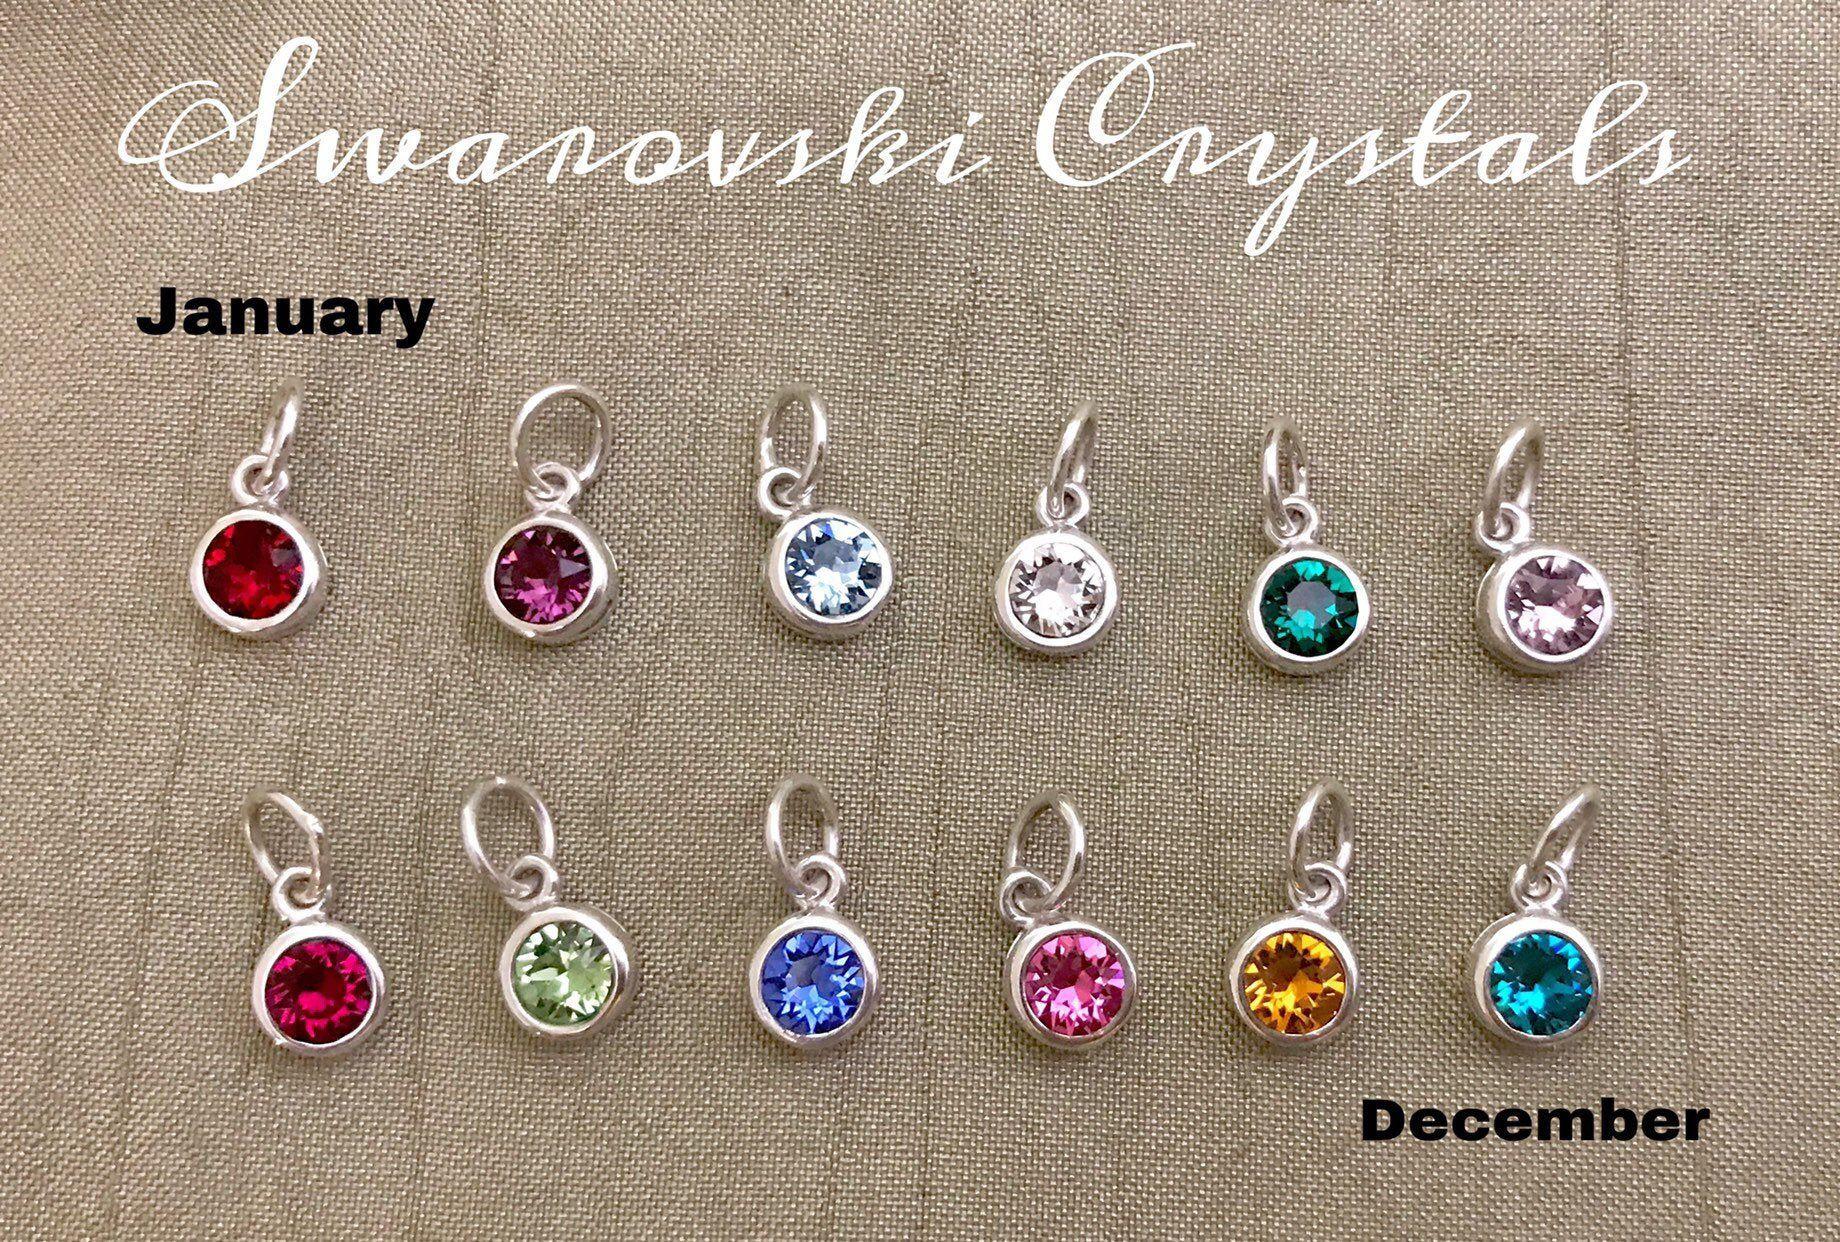 Add A Birthstone 5 5mm Solid Sterling Silver Swarovski Crystal Birthstone Charm Closed Jump Ring Gift Necklace Swarovski Crystals